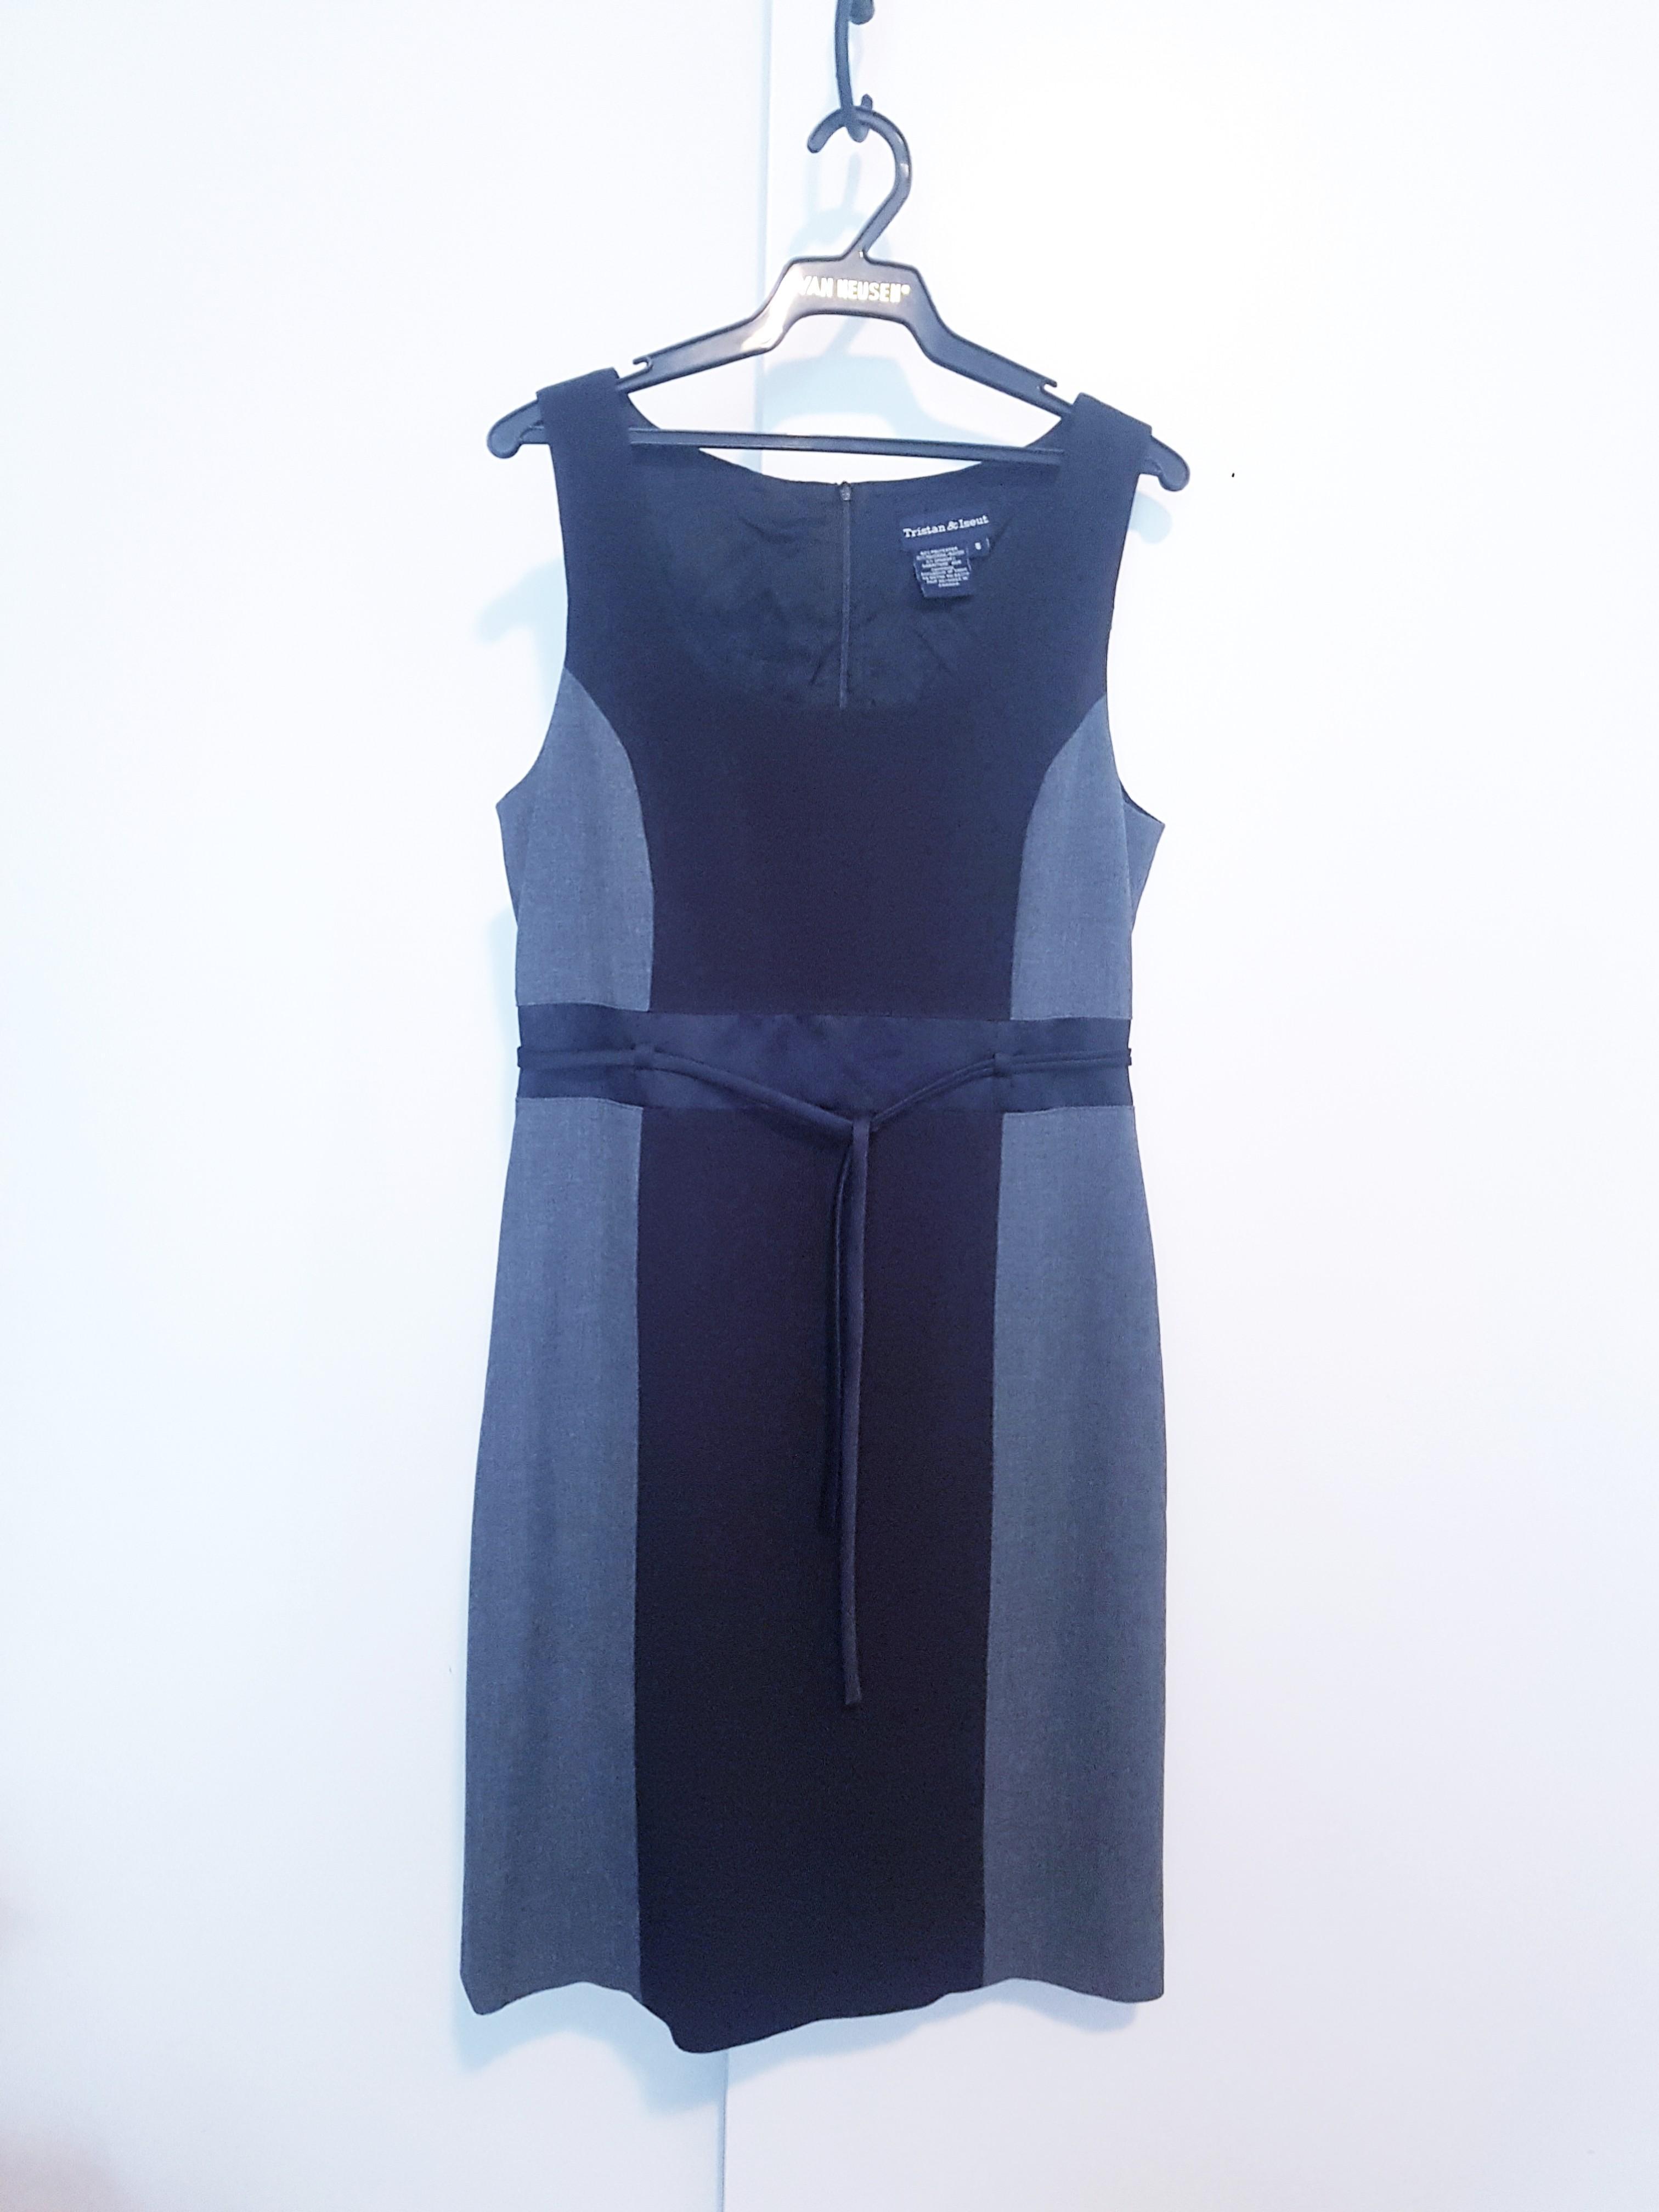 TRISTAN Belted dress